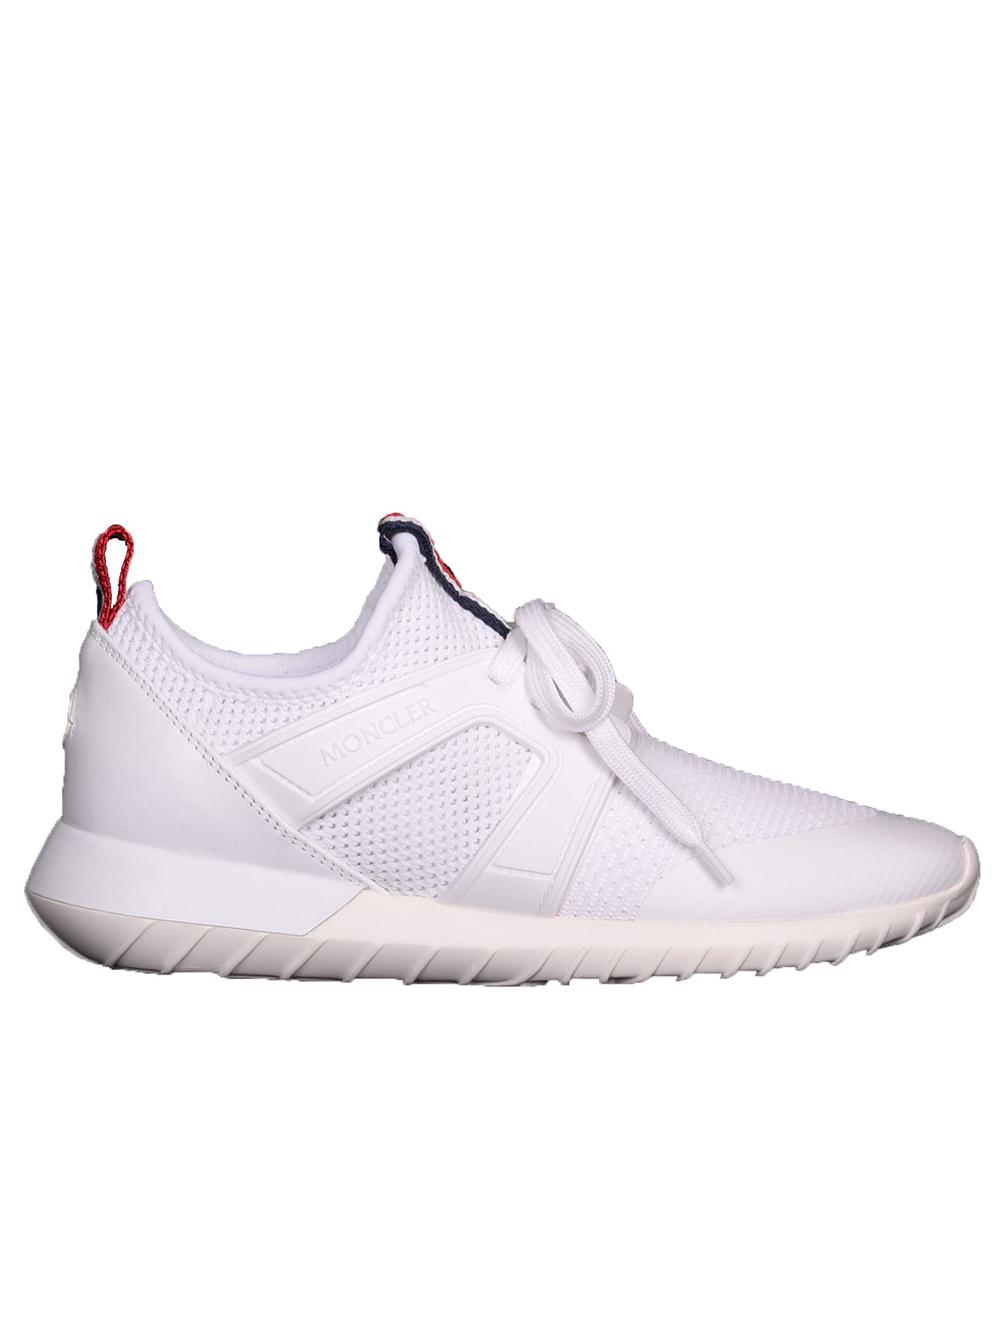 MONCLER Παπούτσια Sneakers E1-09A-2021000 ΛΕΥΚΟ